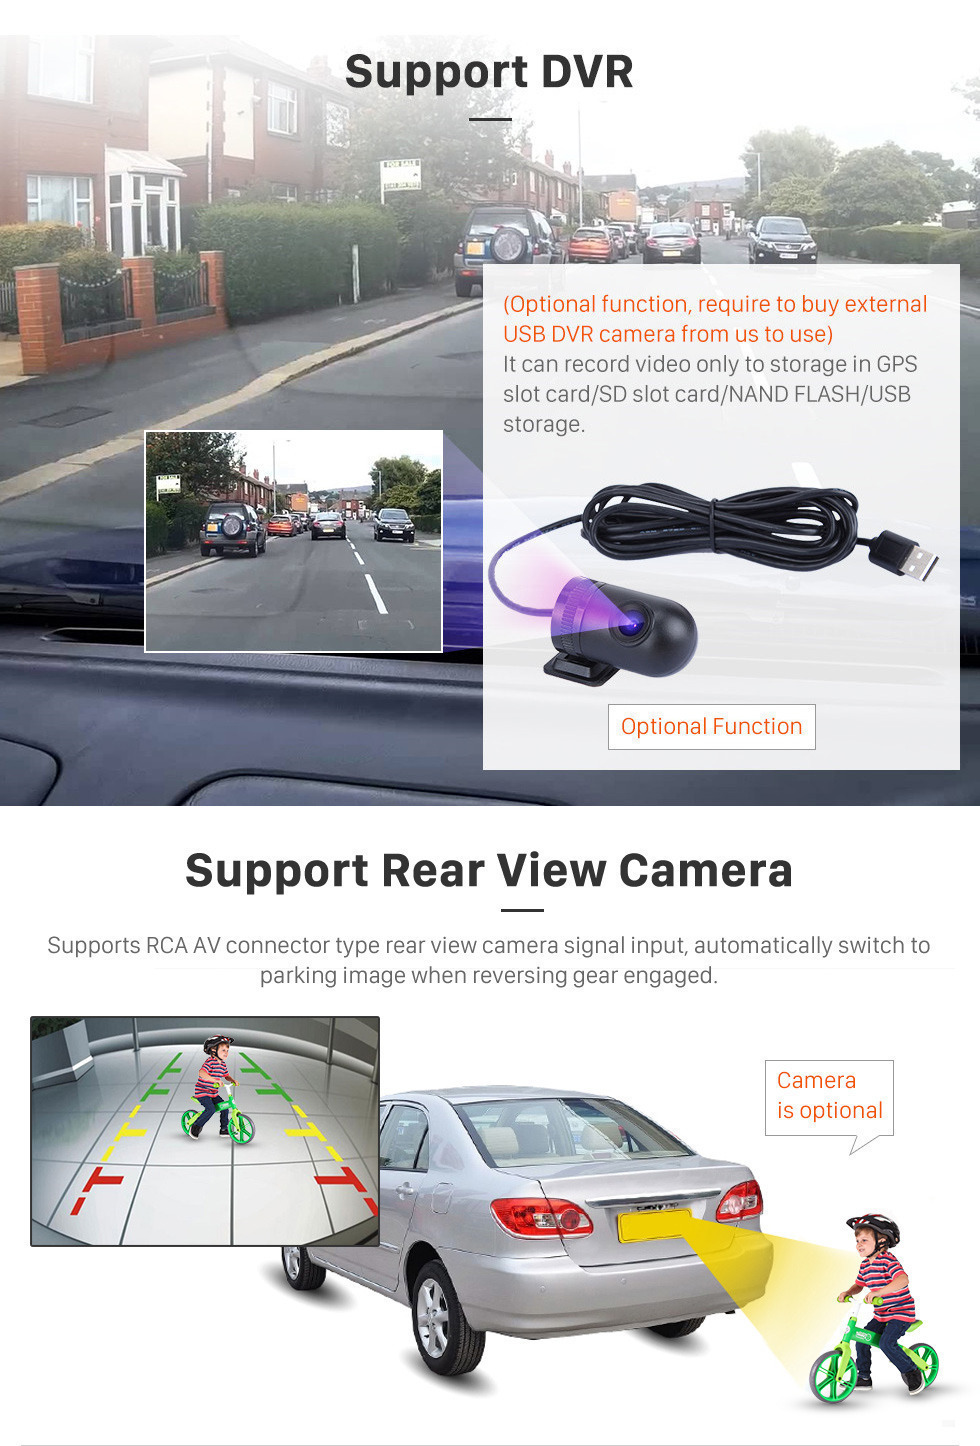 Seicane 9 inch 2011-2015 Hyundai Elantra Android 9.0 HD Touchscreen GPS Navigation system Stereo in Dash Bluetooth Radio Support WIFI USB Phone Music SWC DAB+ Carplay 1080P Video